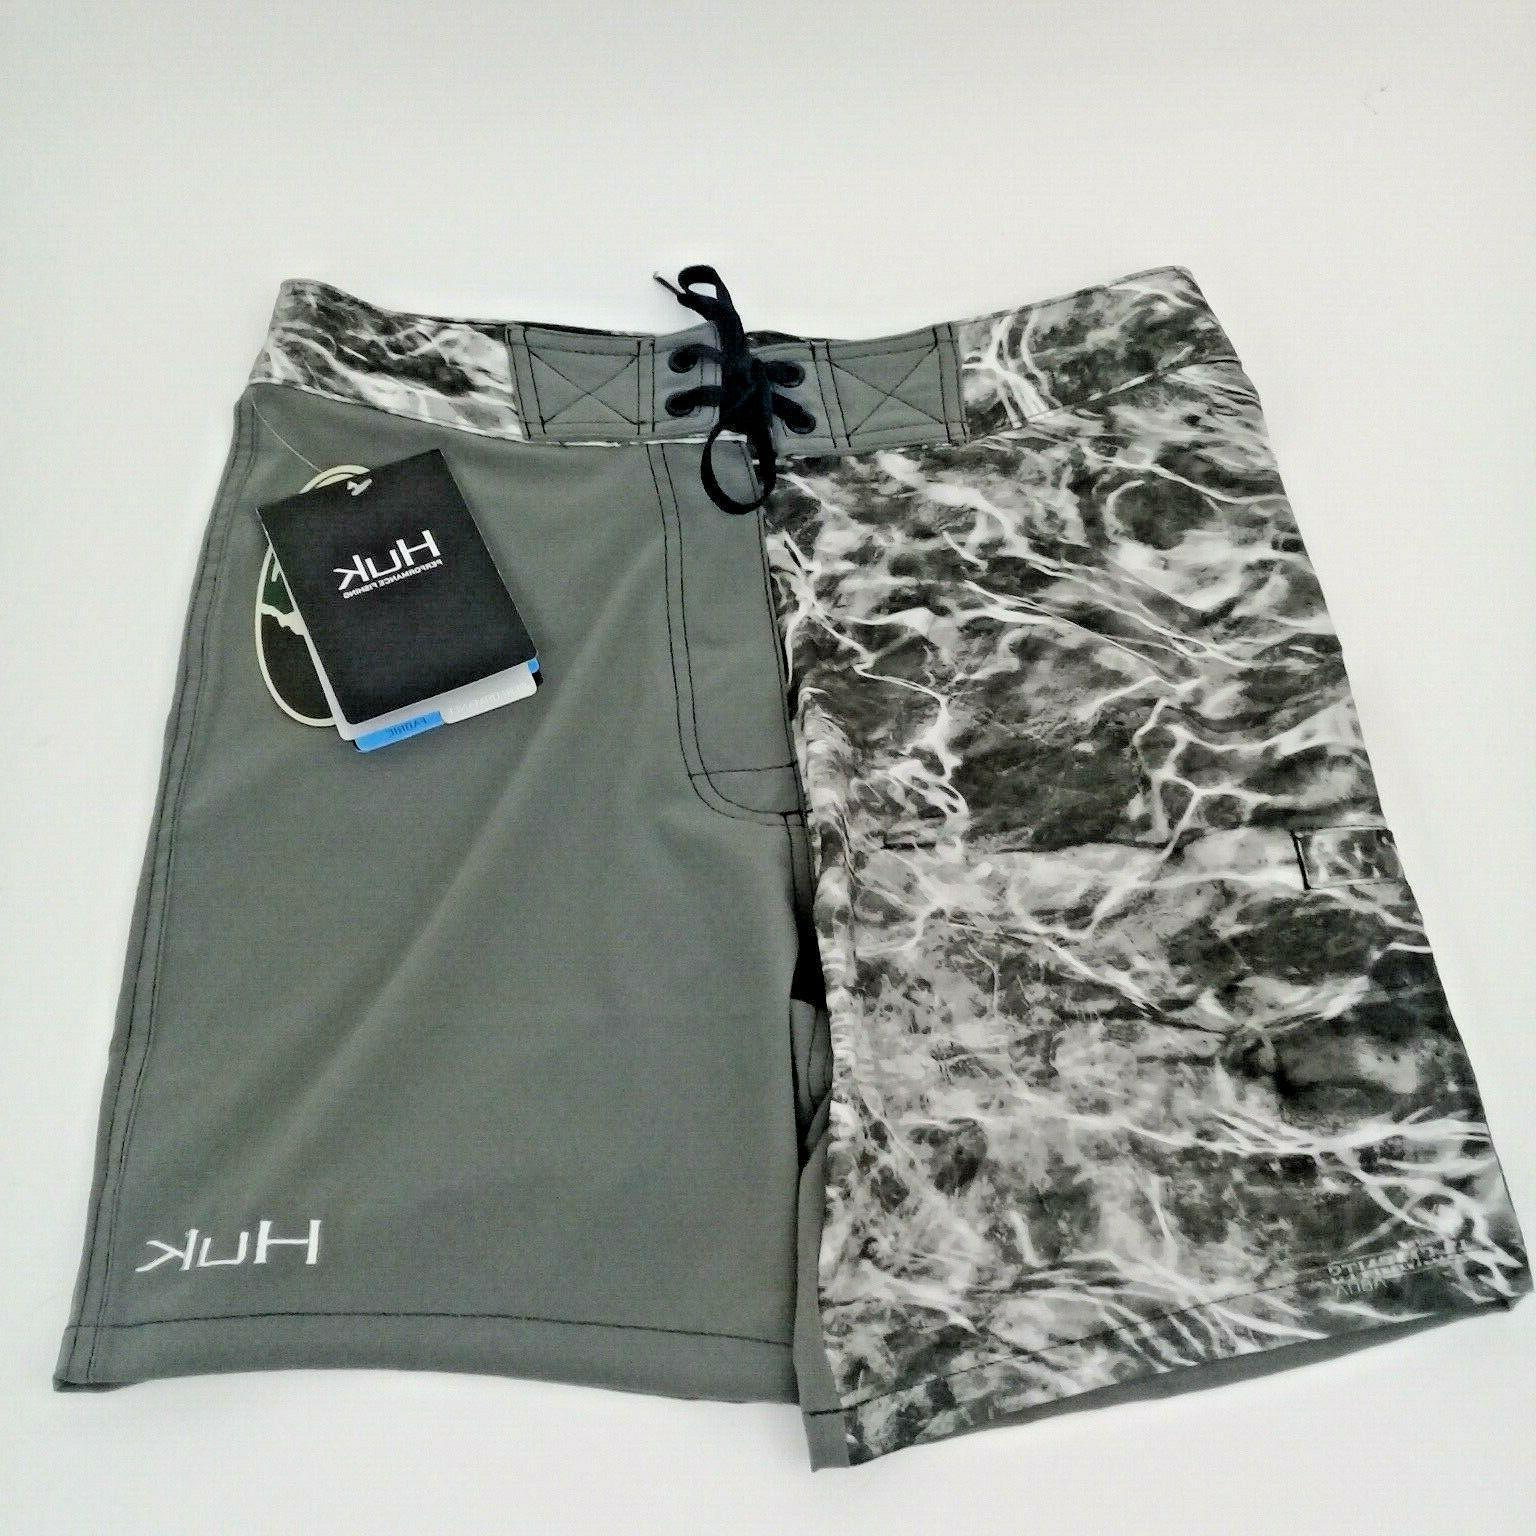 NWT Performance Elements Swim Board Men's Size Shorts $55